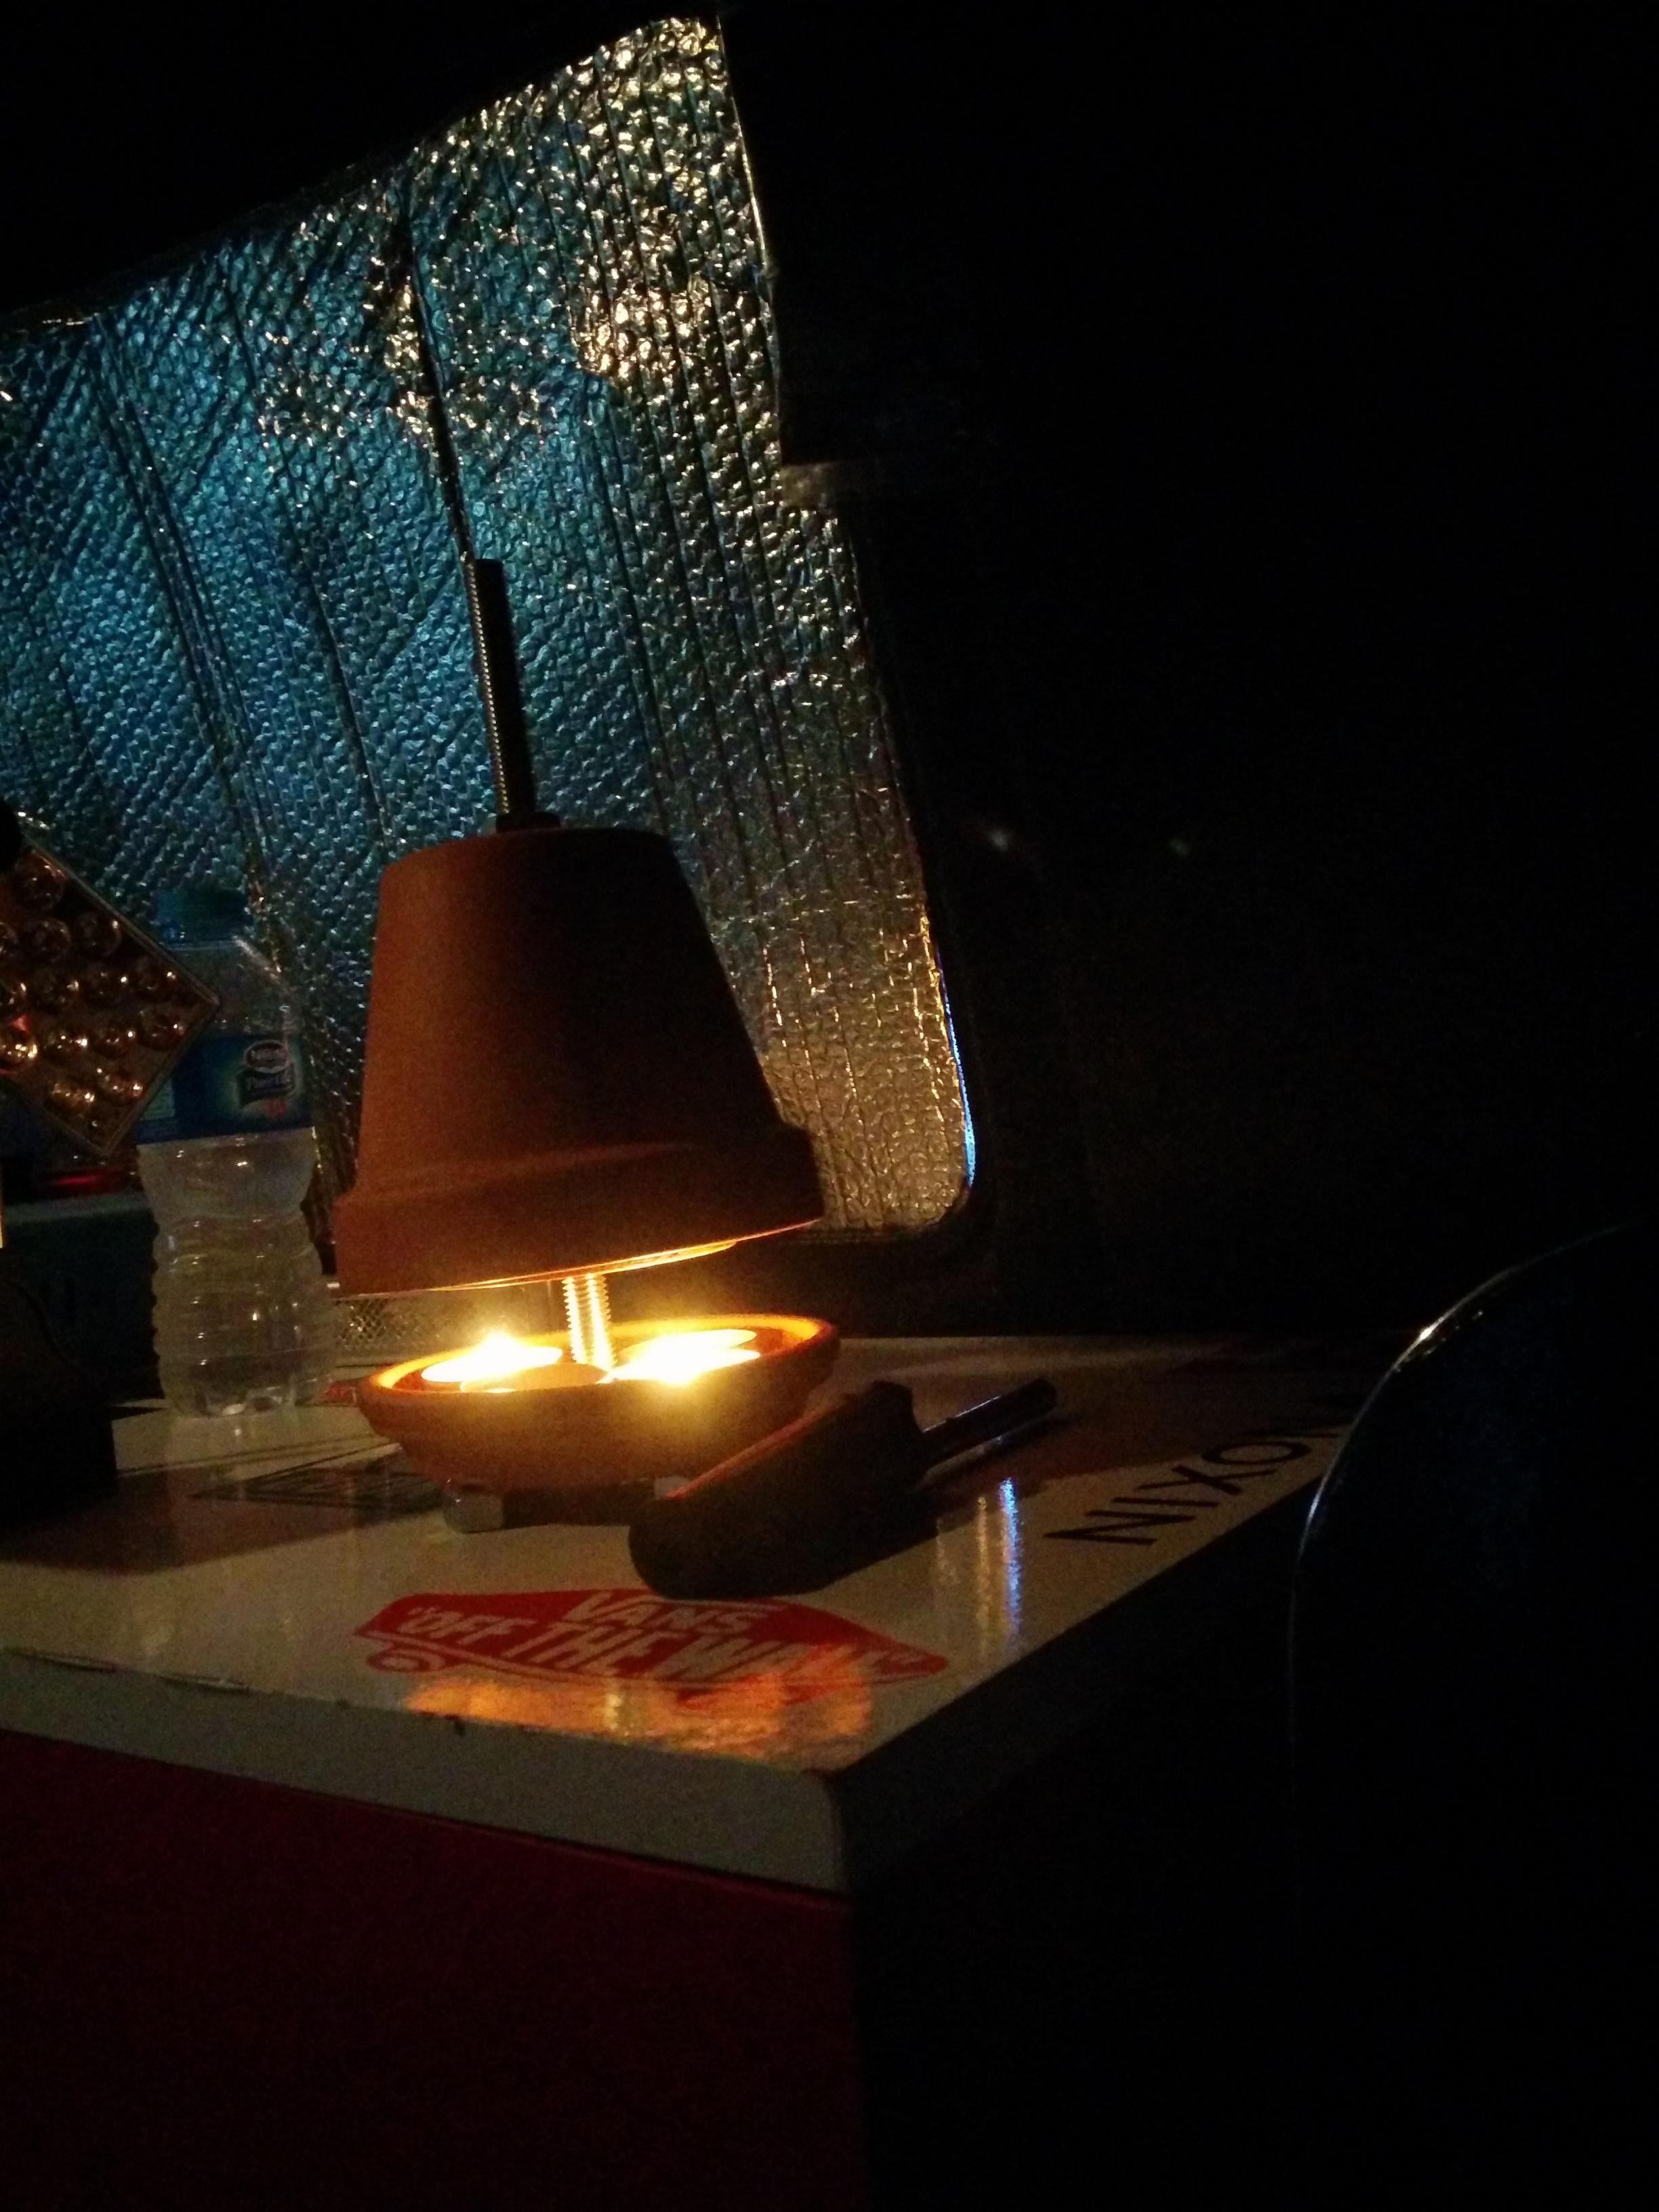 terracotta plant pot candle heater